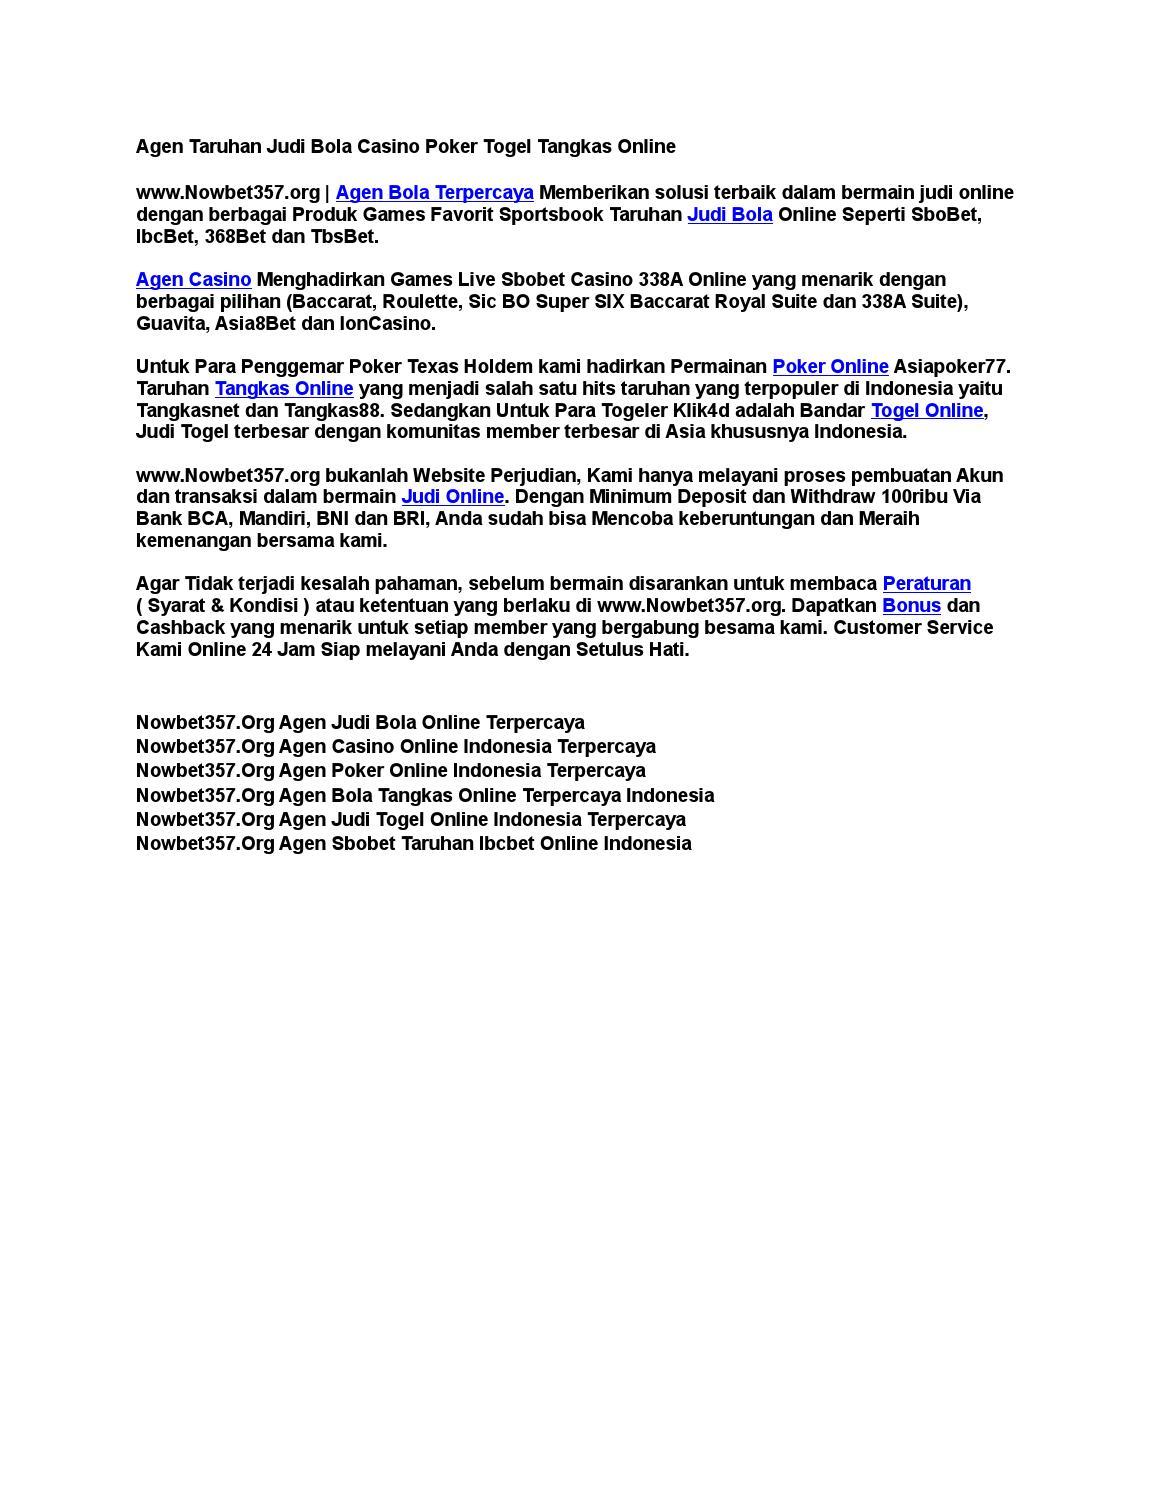 Agen Taruhan Judi Bola Casino Poker Togel Tangkas Online By Agen Sbobet Online Wap Asia Indonesia Mobile Issuu